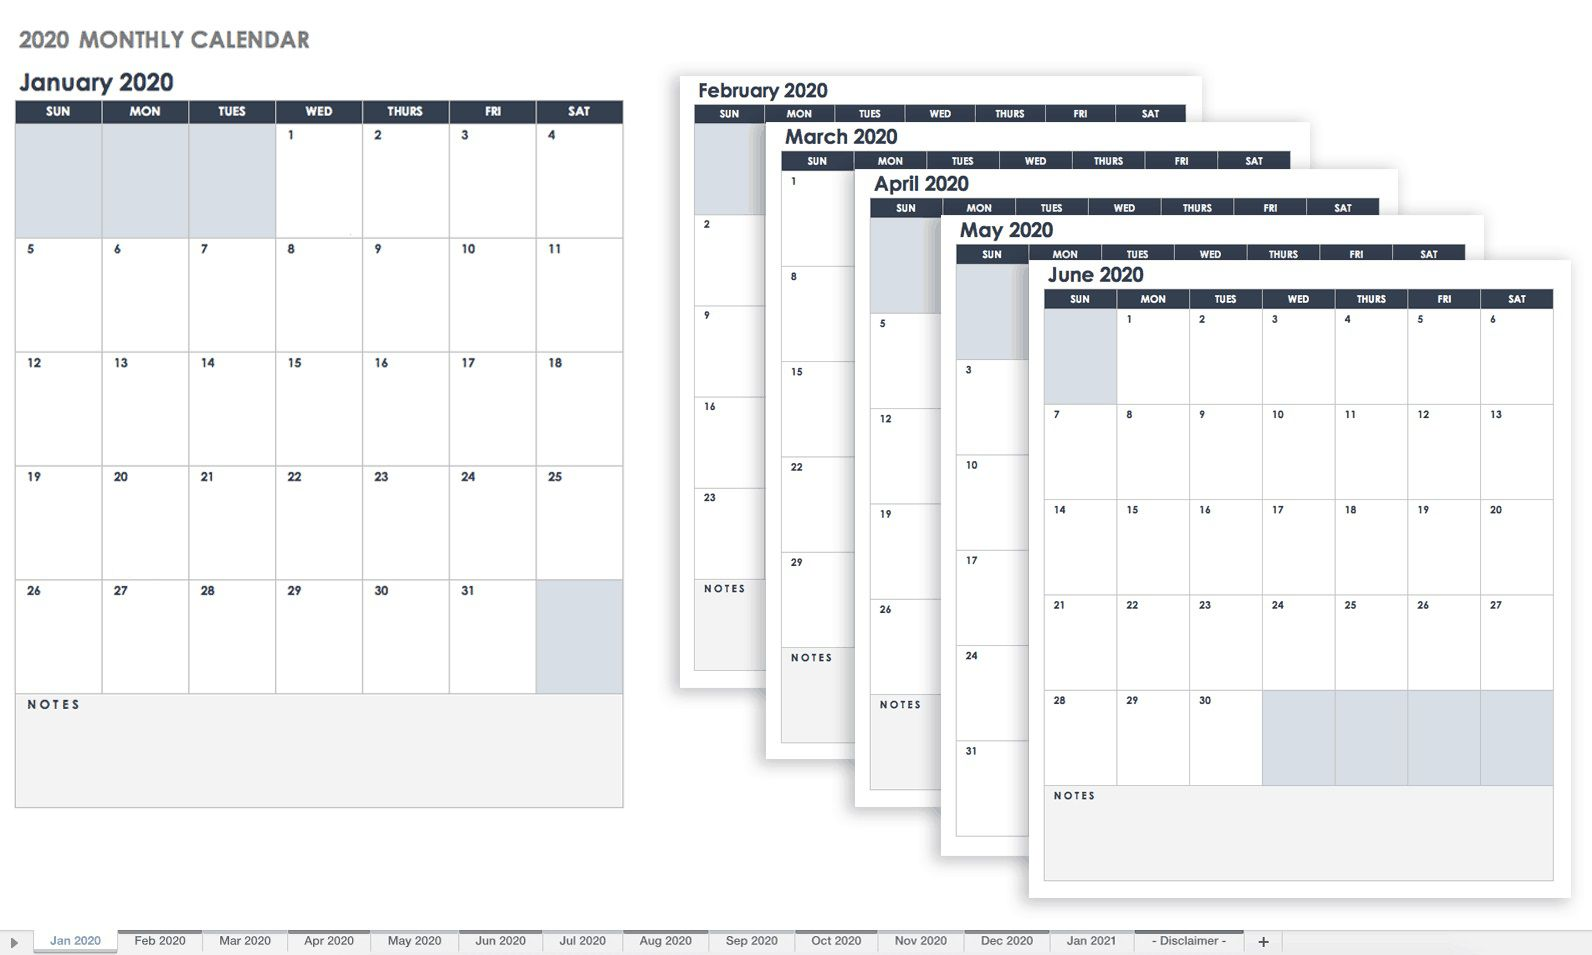 003 Fantastic Google Doc Calendar Template 2020 Photo  Drive Sheet WeeklyFull